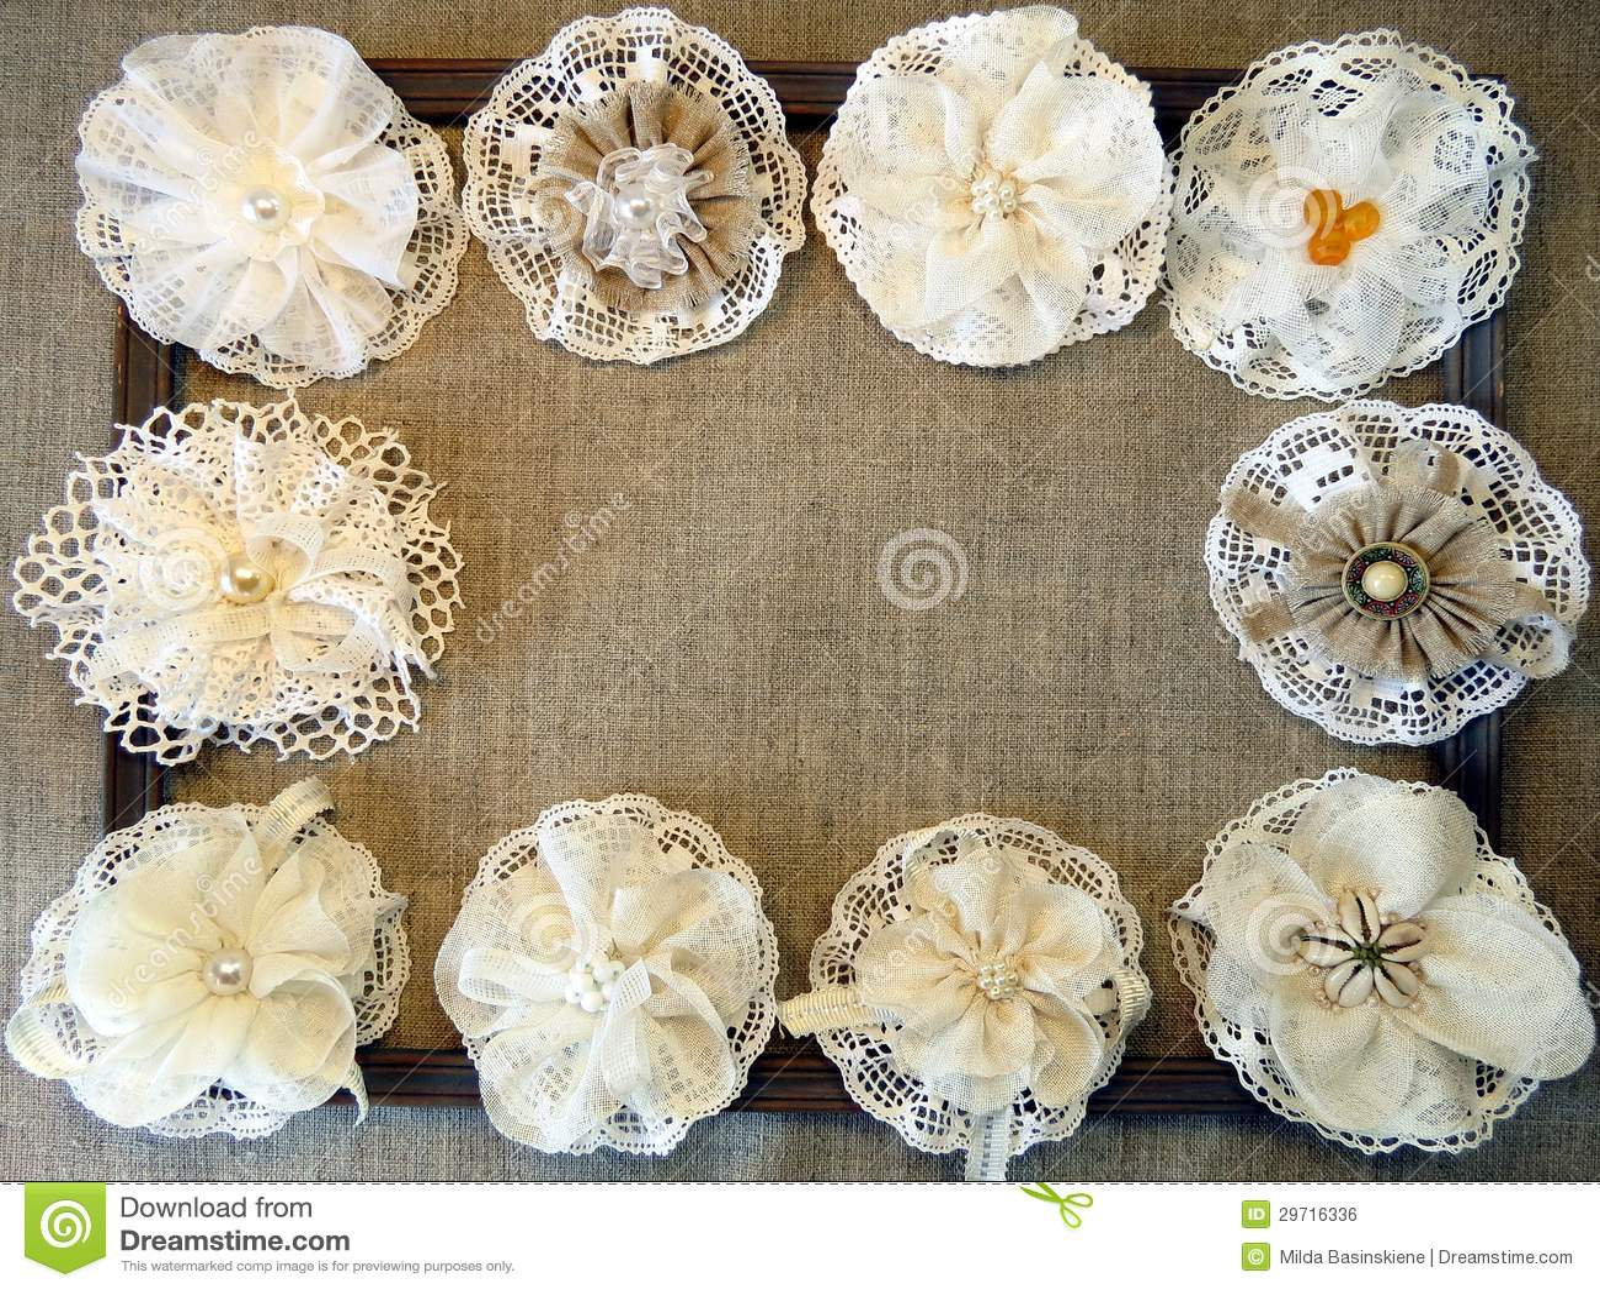 Fleurs artificielles de tissu image libre de droits for Fleurs artificielles tissu